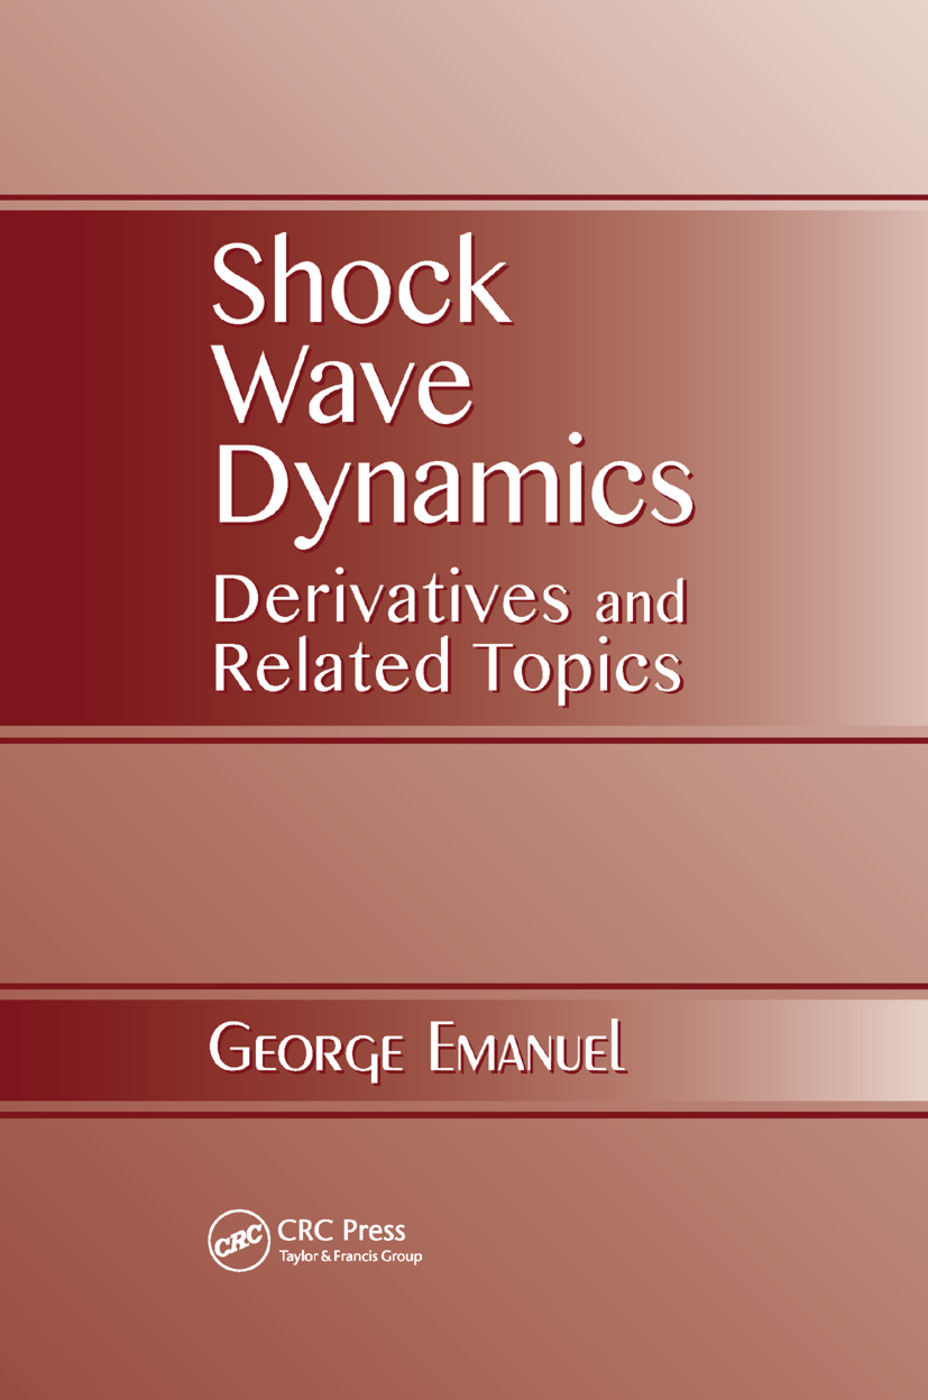 Shock Wave Dynamics